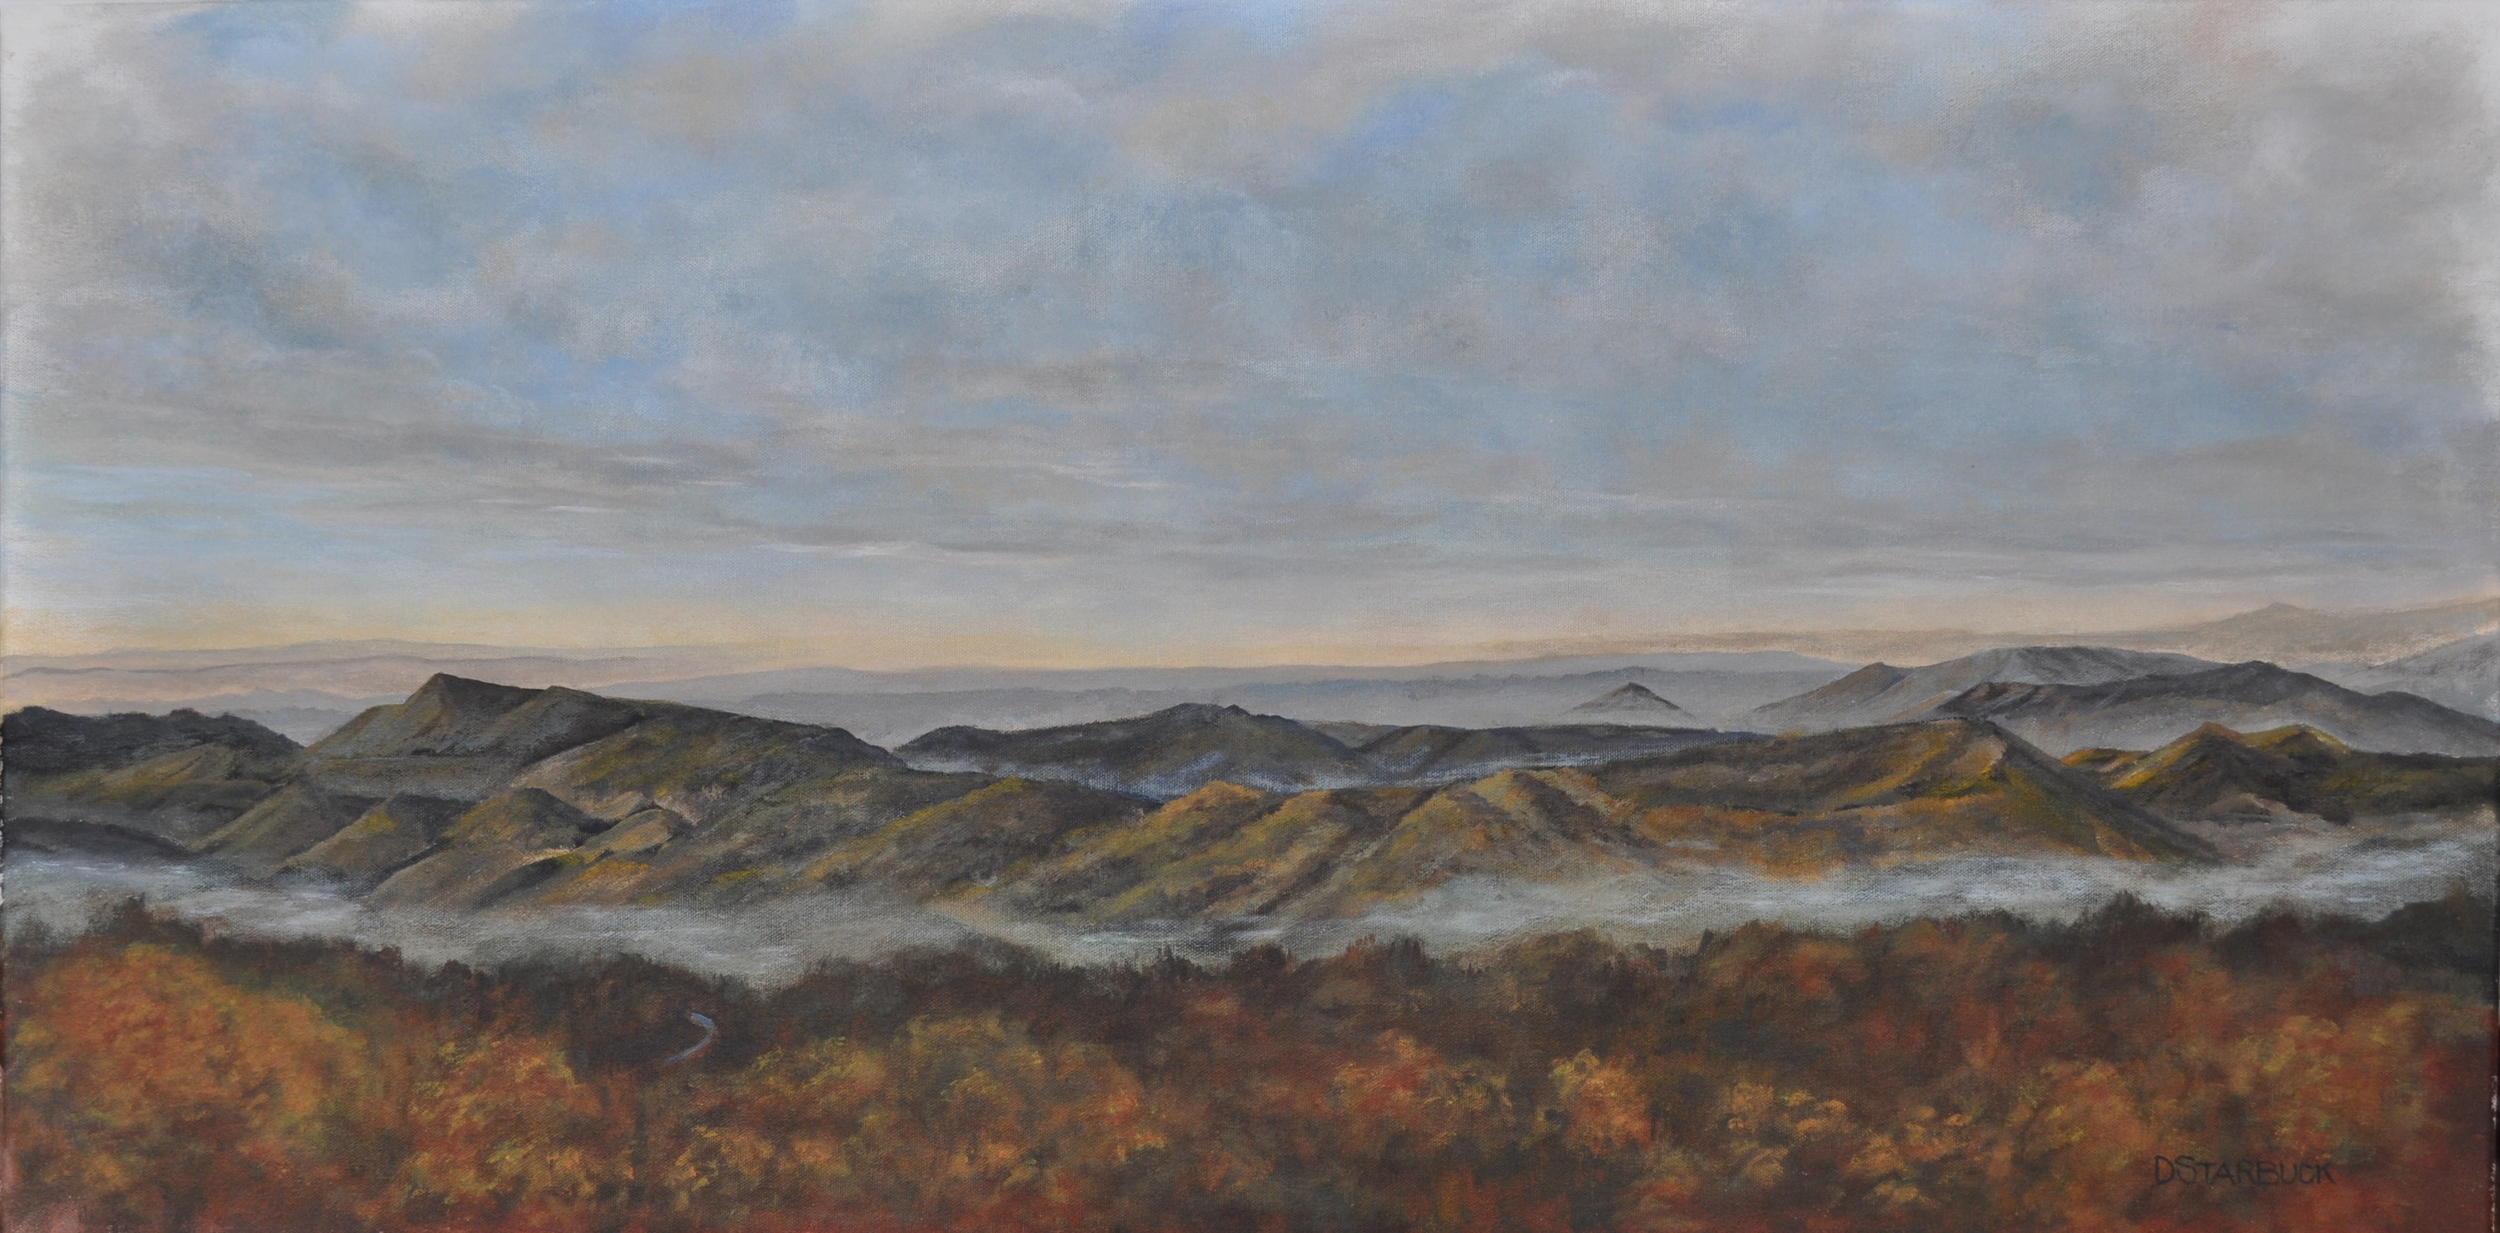 """For Miles & Miles"" A Blowing Rock Vista View, North Carolina  Original: Acrylic on Canvas, 36"" x 18"""